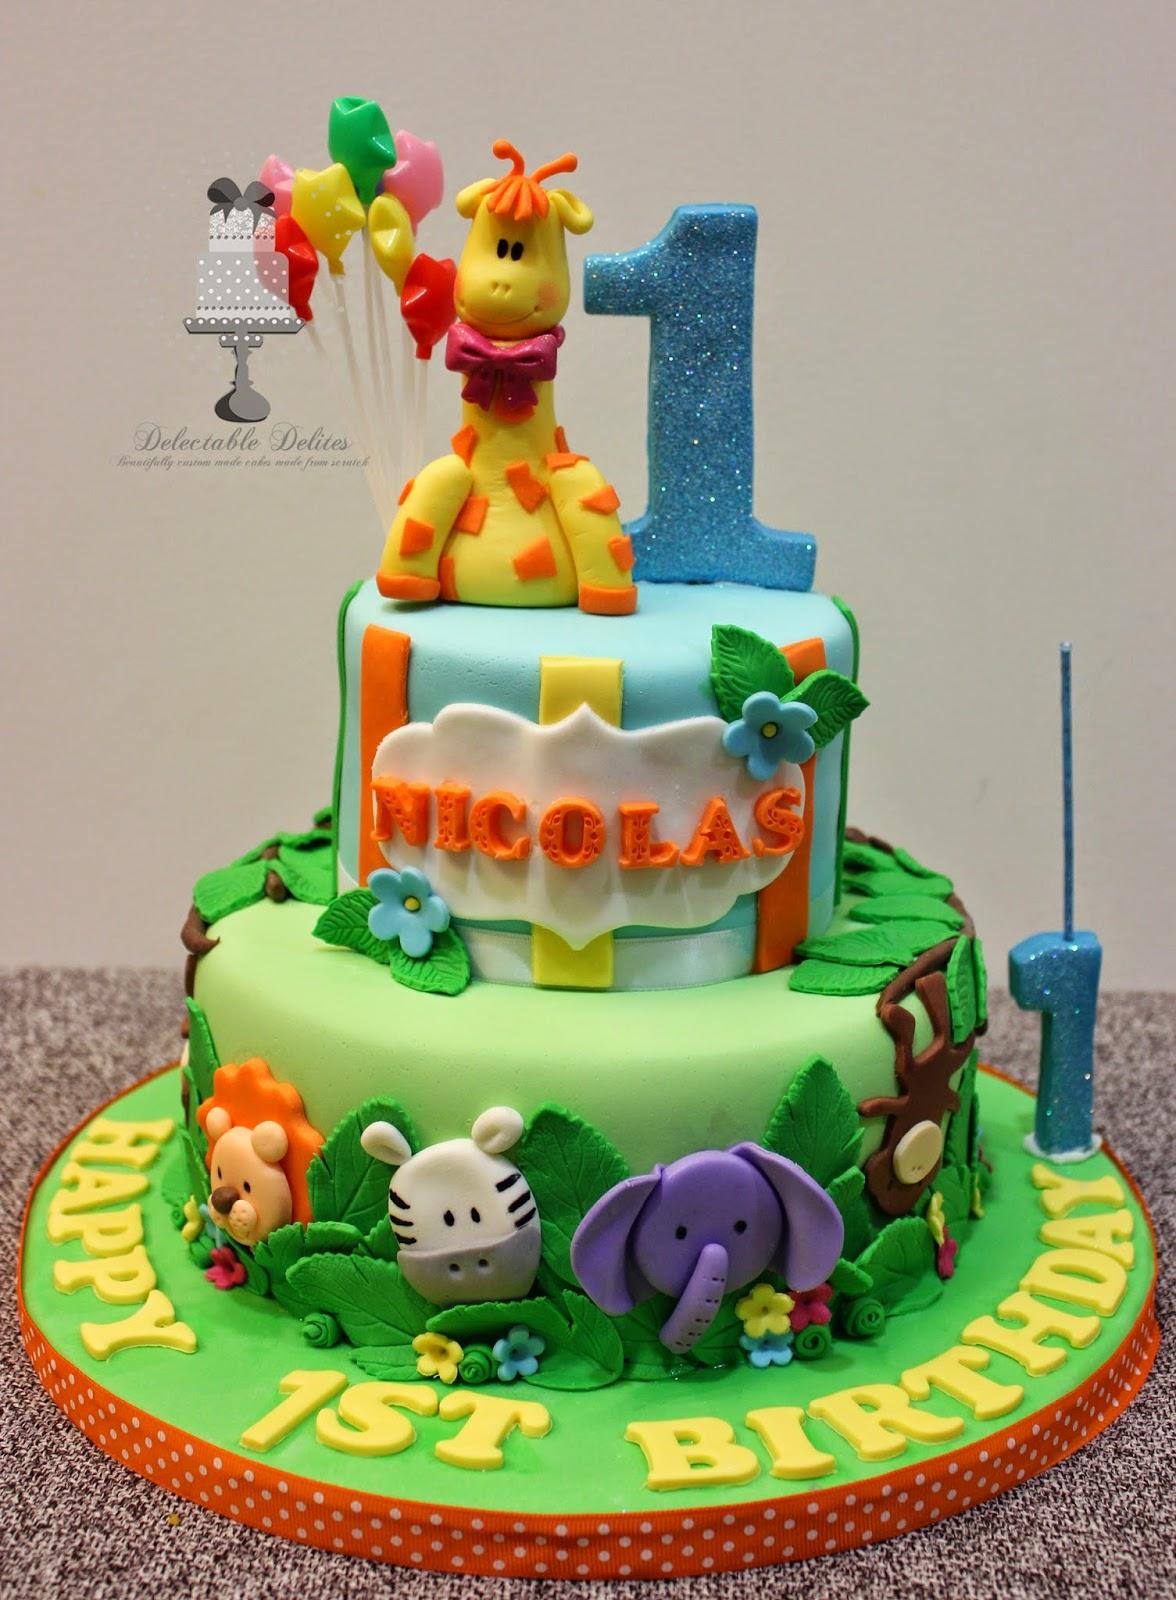 Delectable Delites Safari Theme For Nicolas S 1st Birthday